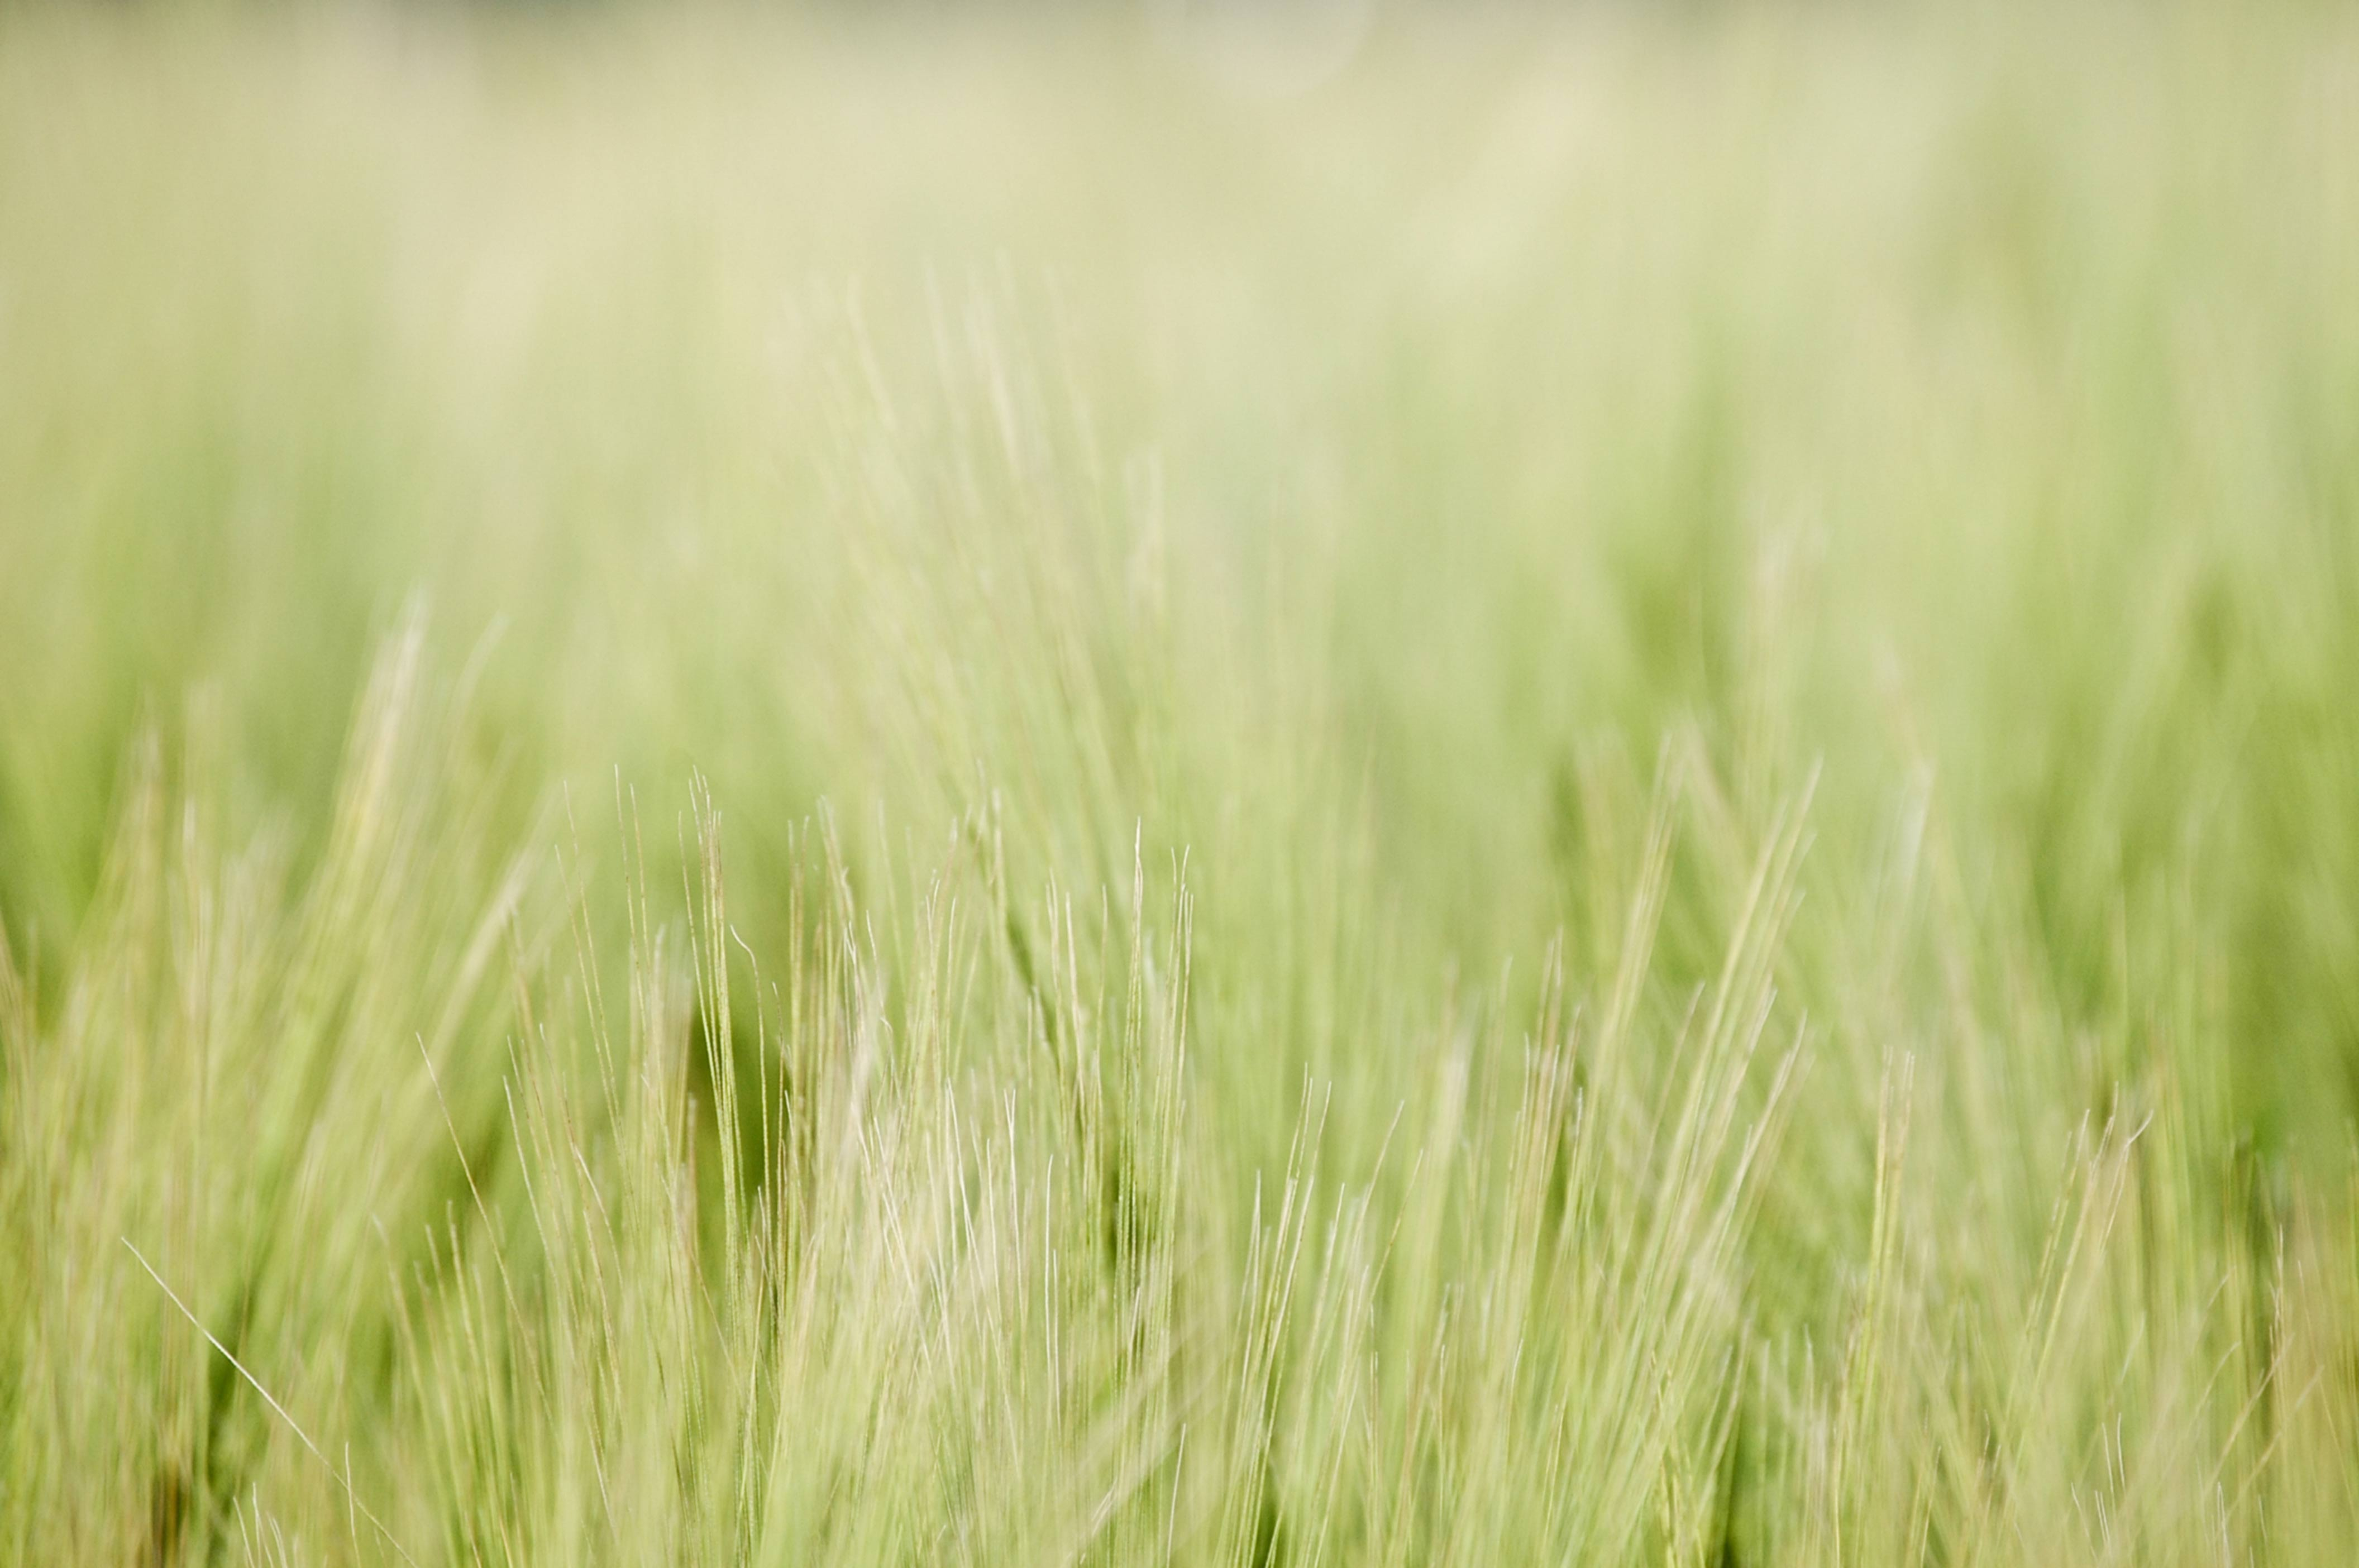 Blurry green weed grass